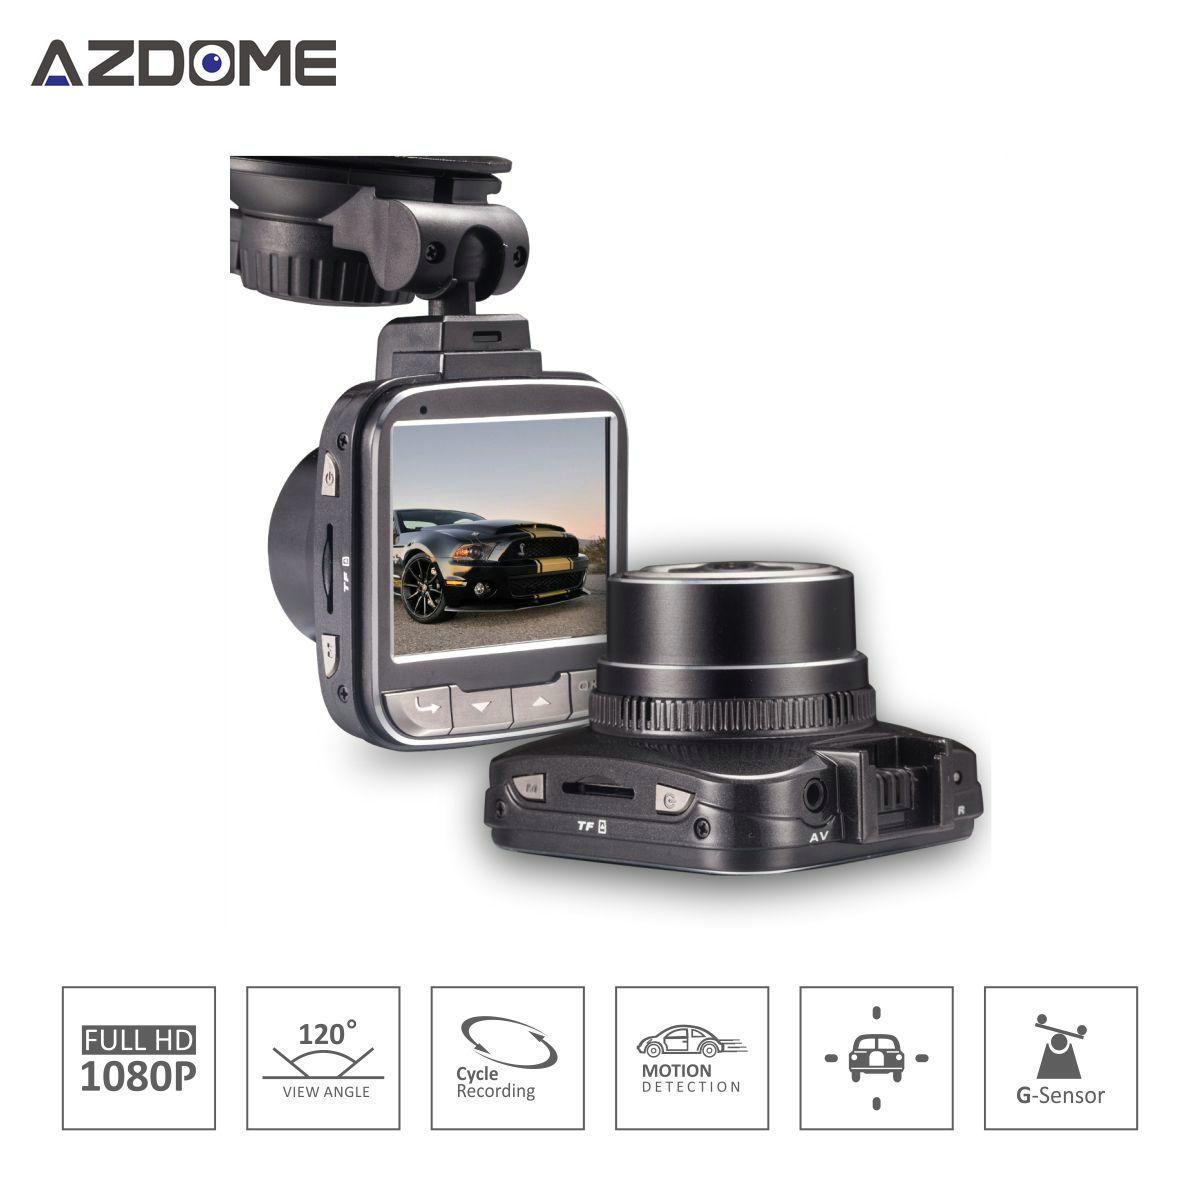 Azdome G50 Car DVR Auto Camera Novatek 96650 Chip Full HD 1080p 30fps Dash Cam 2.0'Lcd G-sensor WDR Car Video Recorder H15